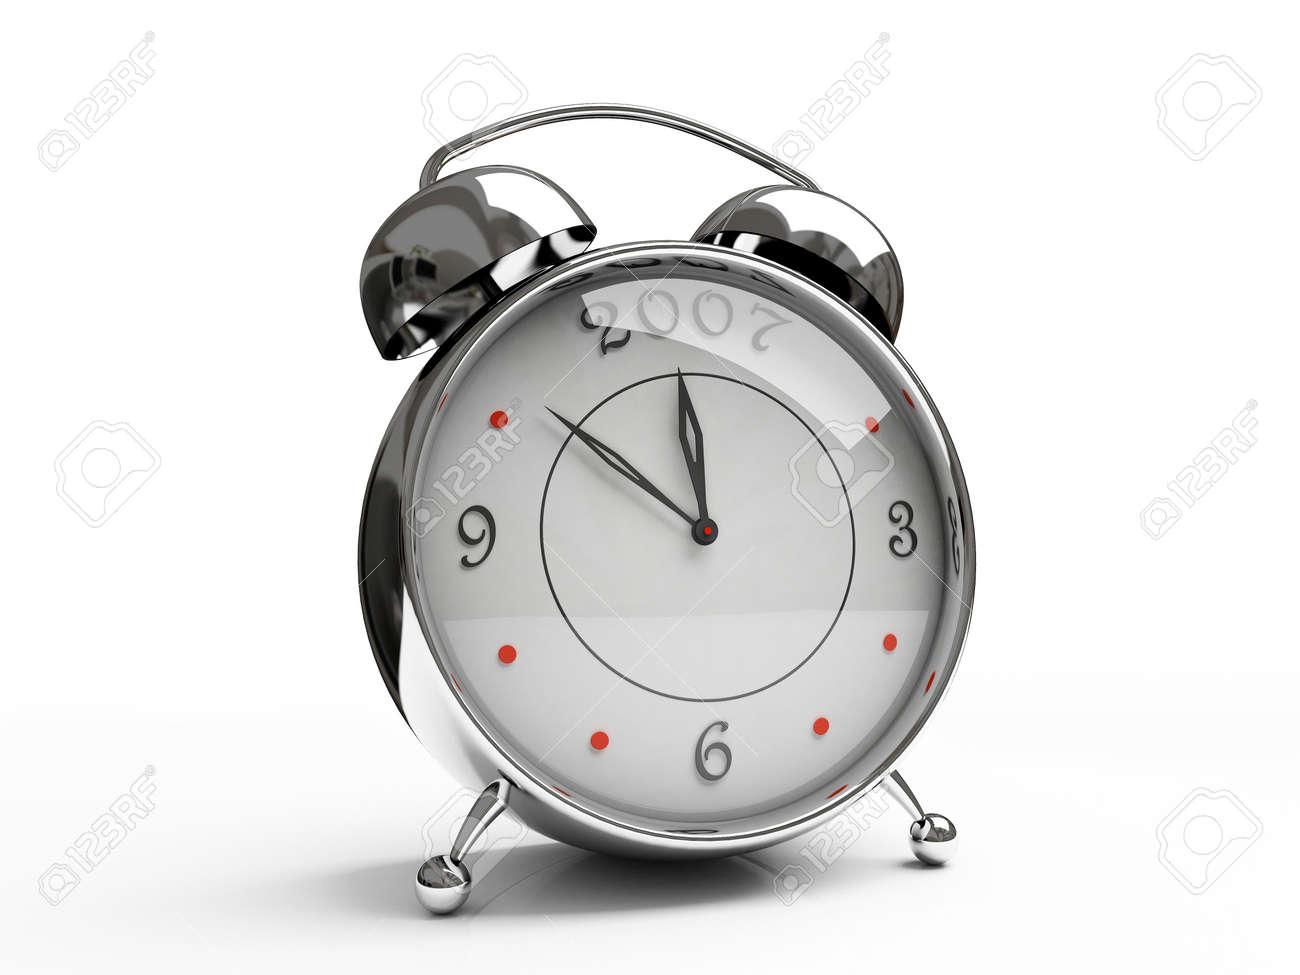 Metallic alarm clock isolated on white background 3D Stock Photo - 666991